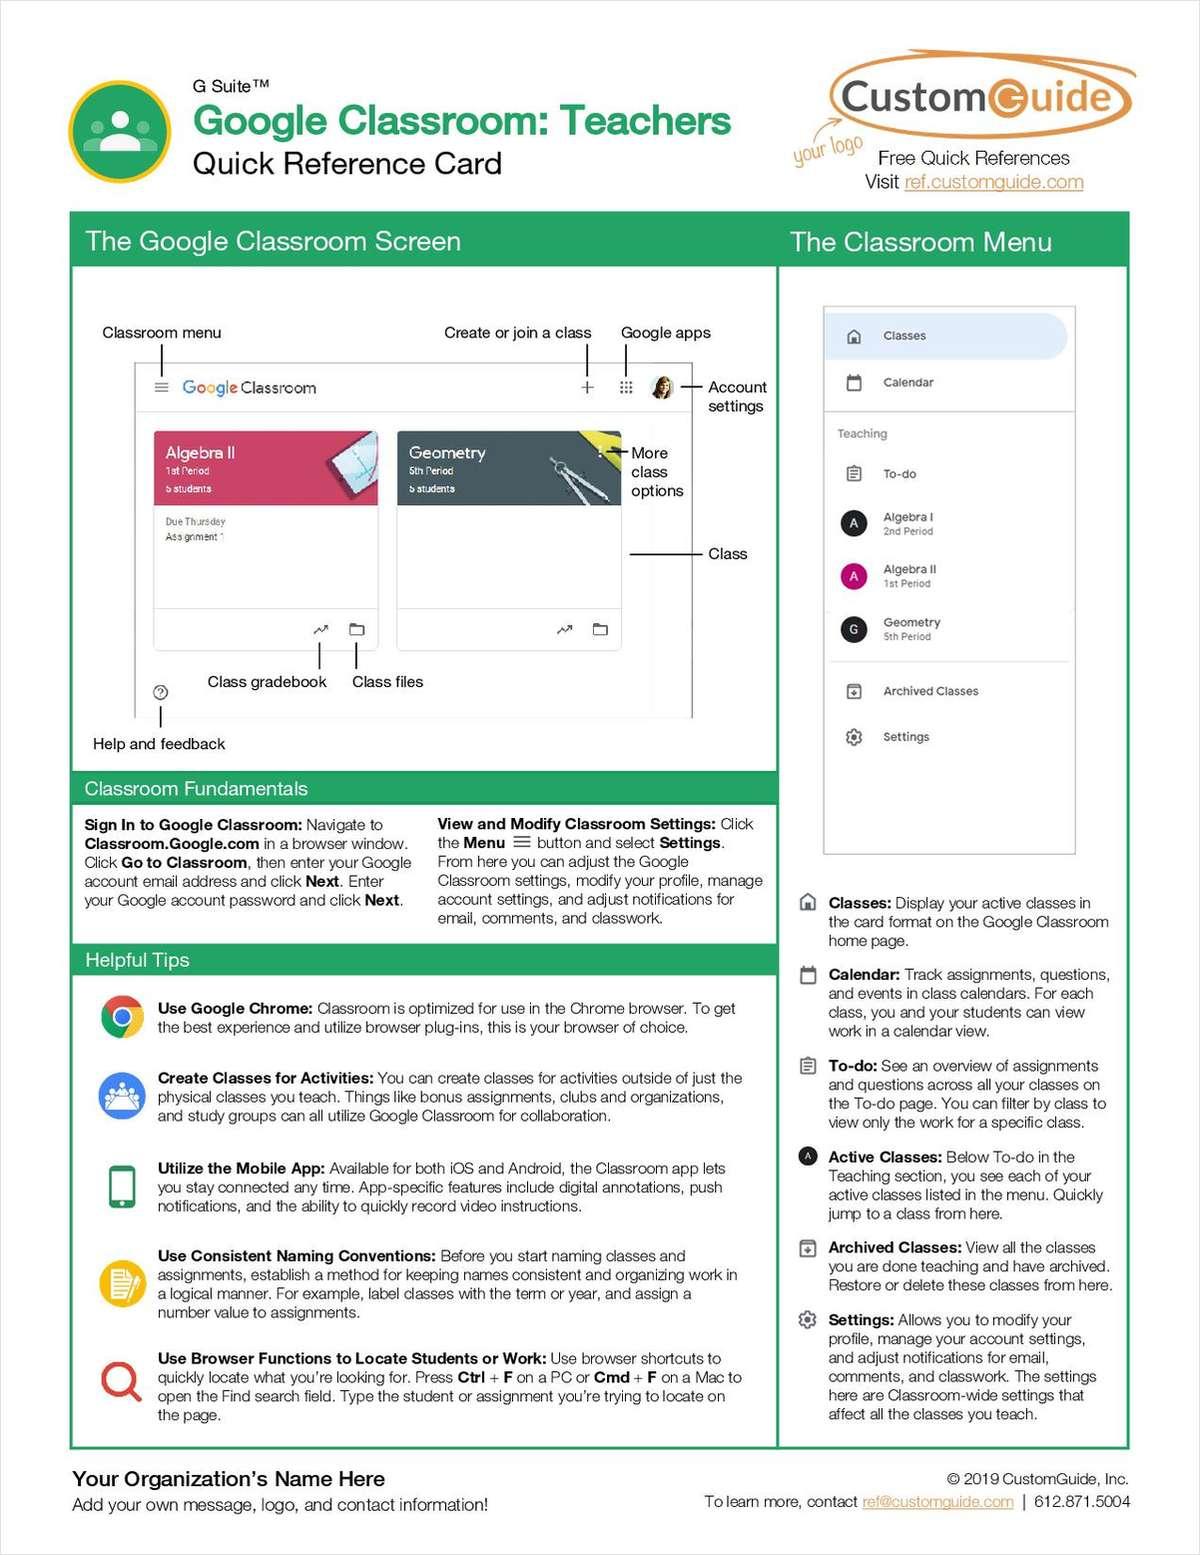 Google Classroom: Teachers- Free Reference Card